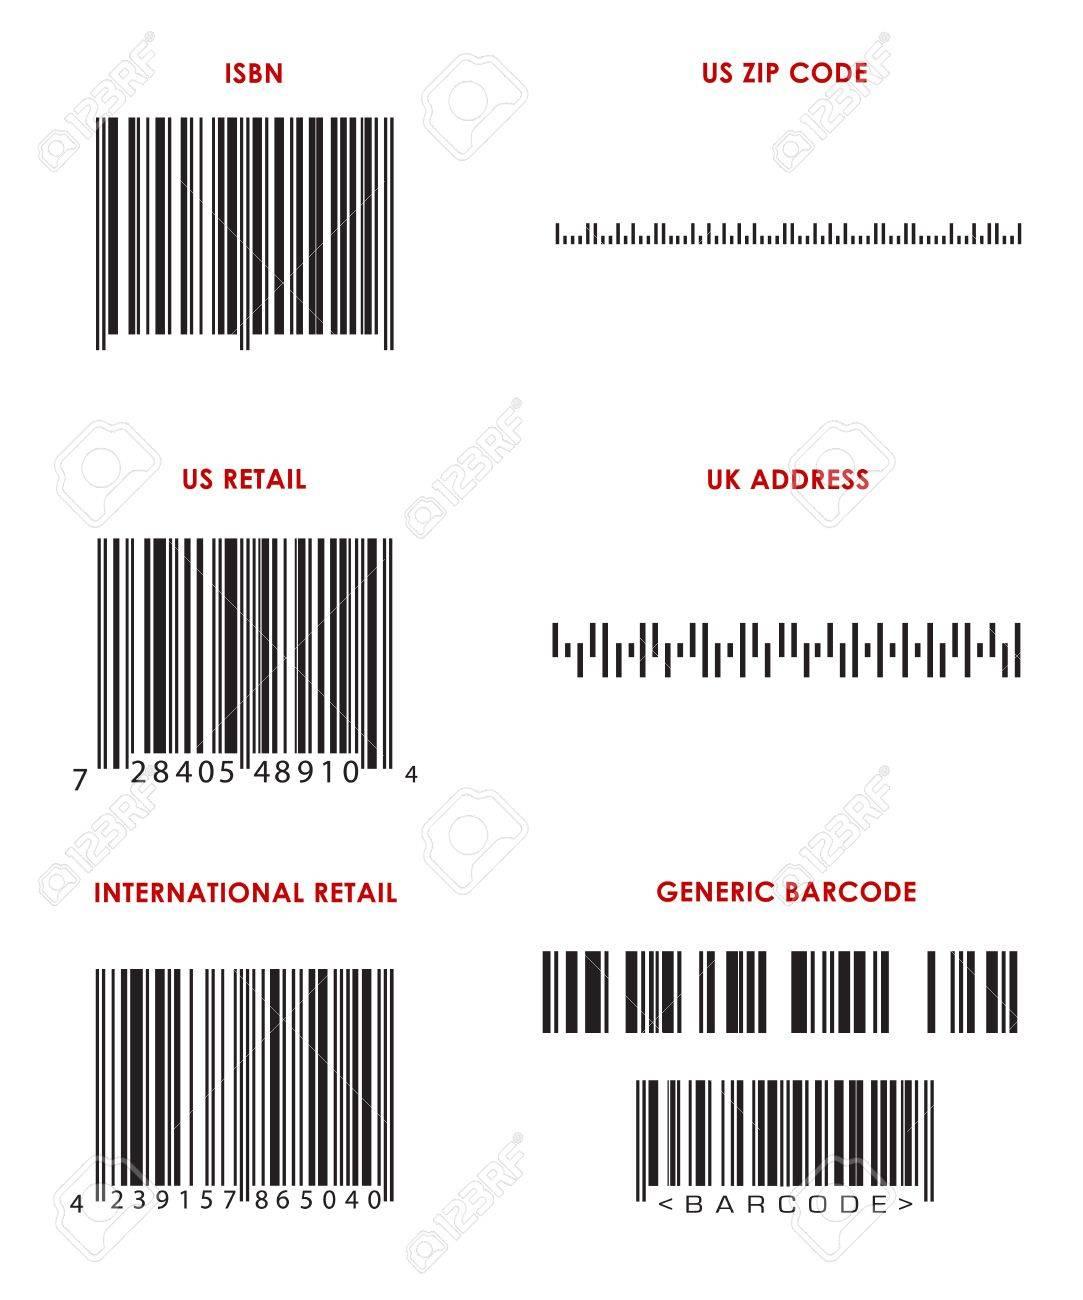 Bar codes of various formats (UPC, EAN, ISBN, Zip Code, UK address